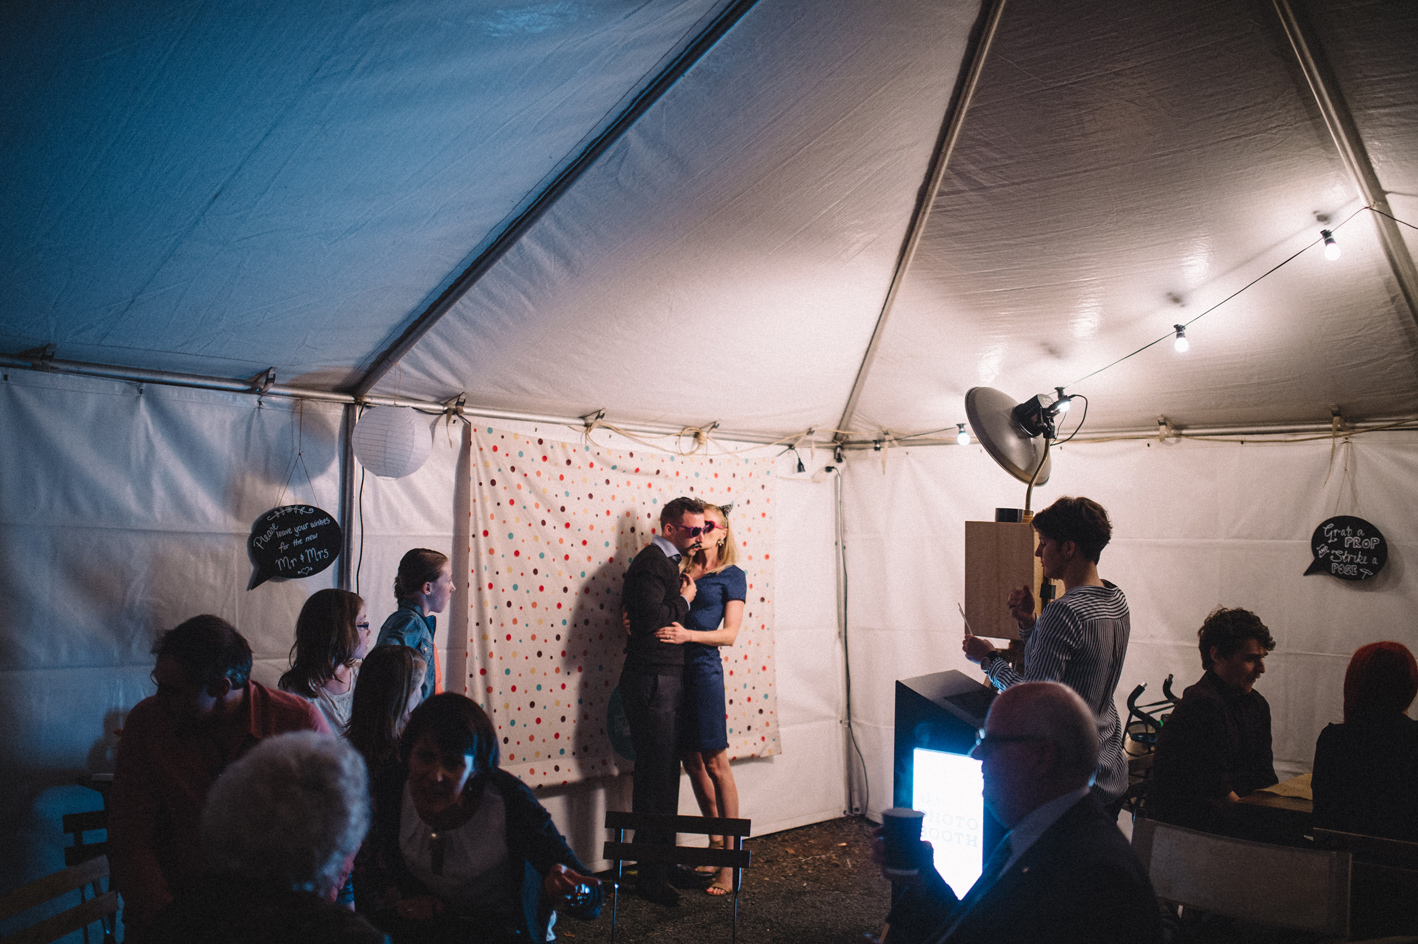 090-michelle-reagan-mount-tamborine-wedding-sophie-baker-photography